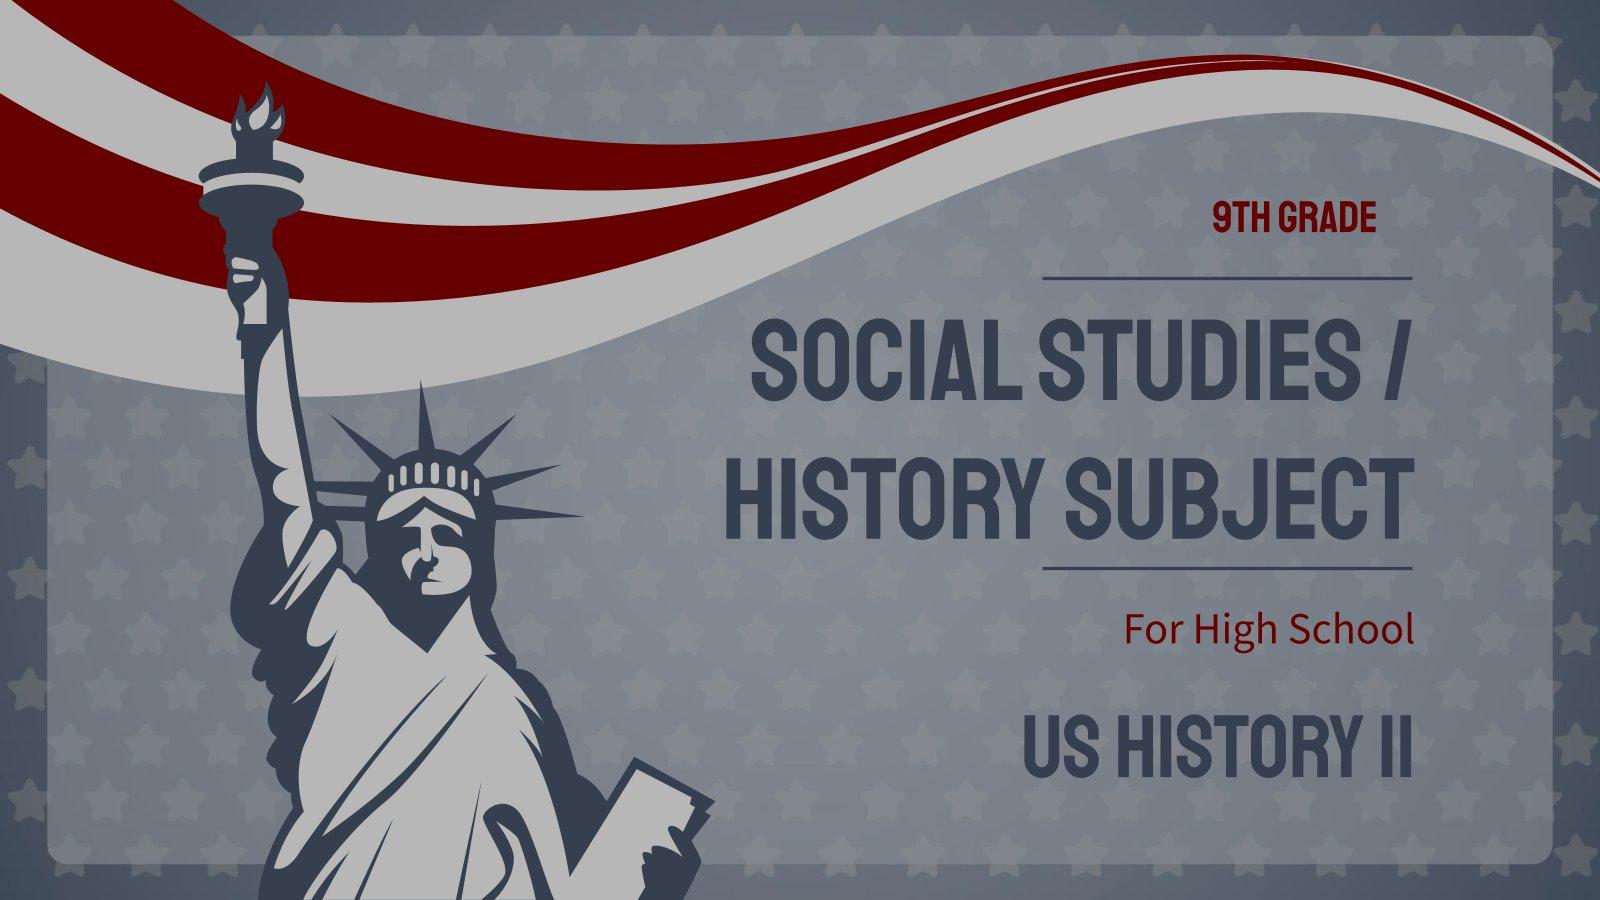 Social Studies/History Subject for High School - 9th Grade: US History II presentation template